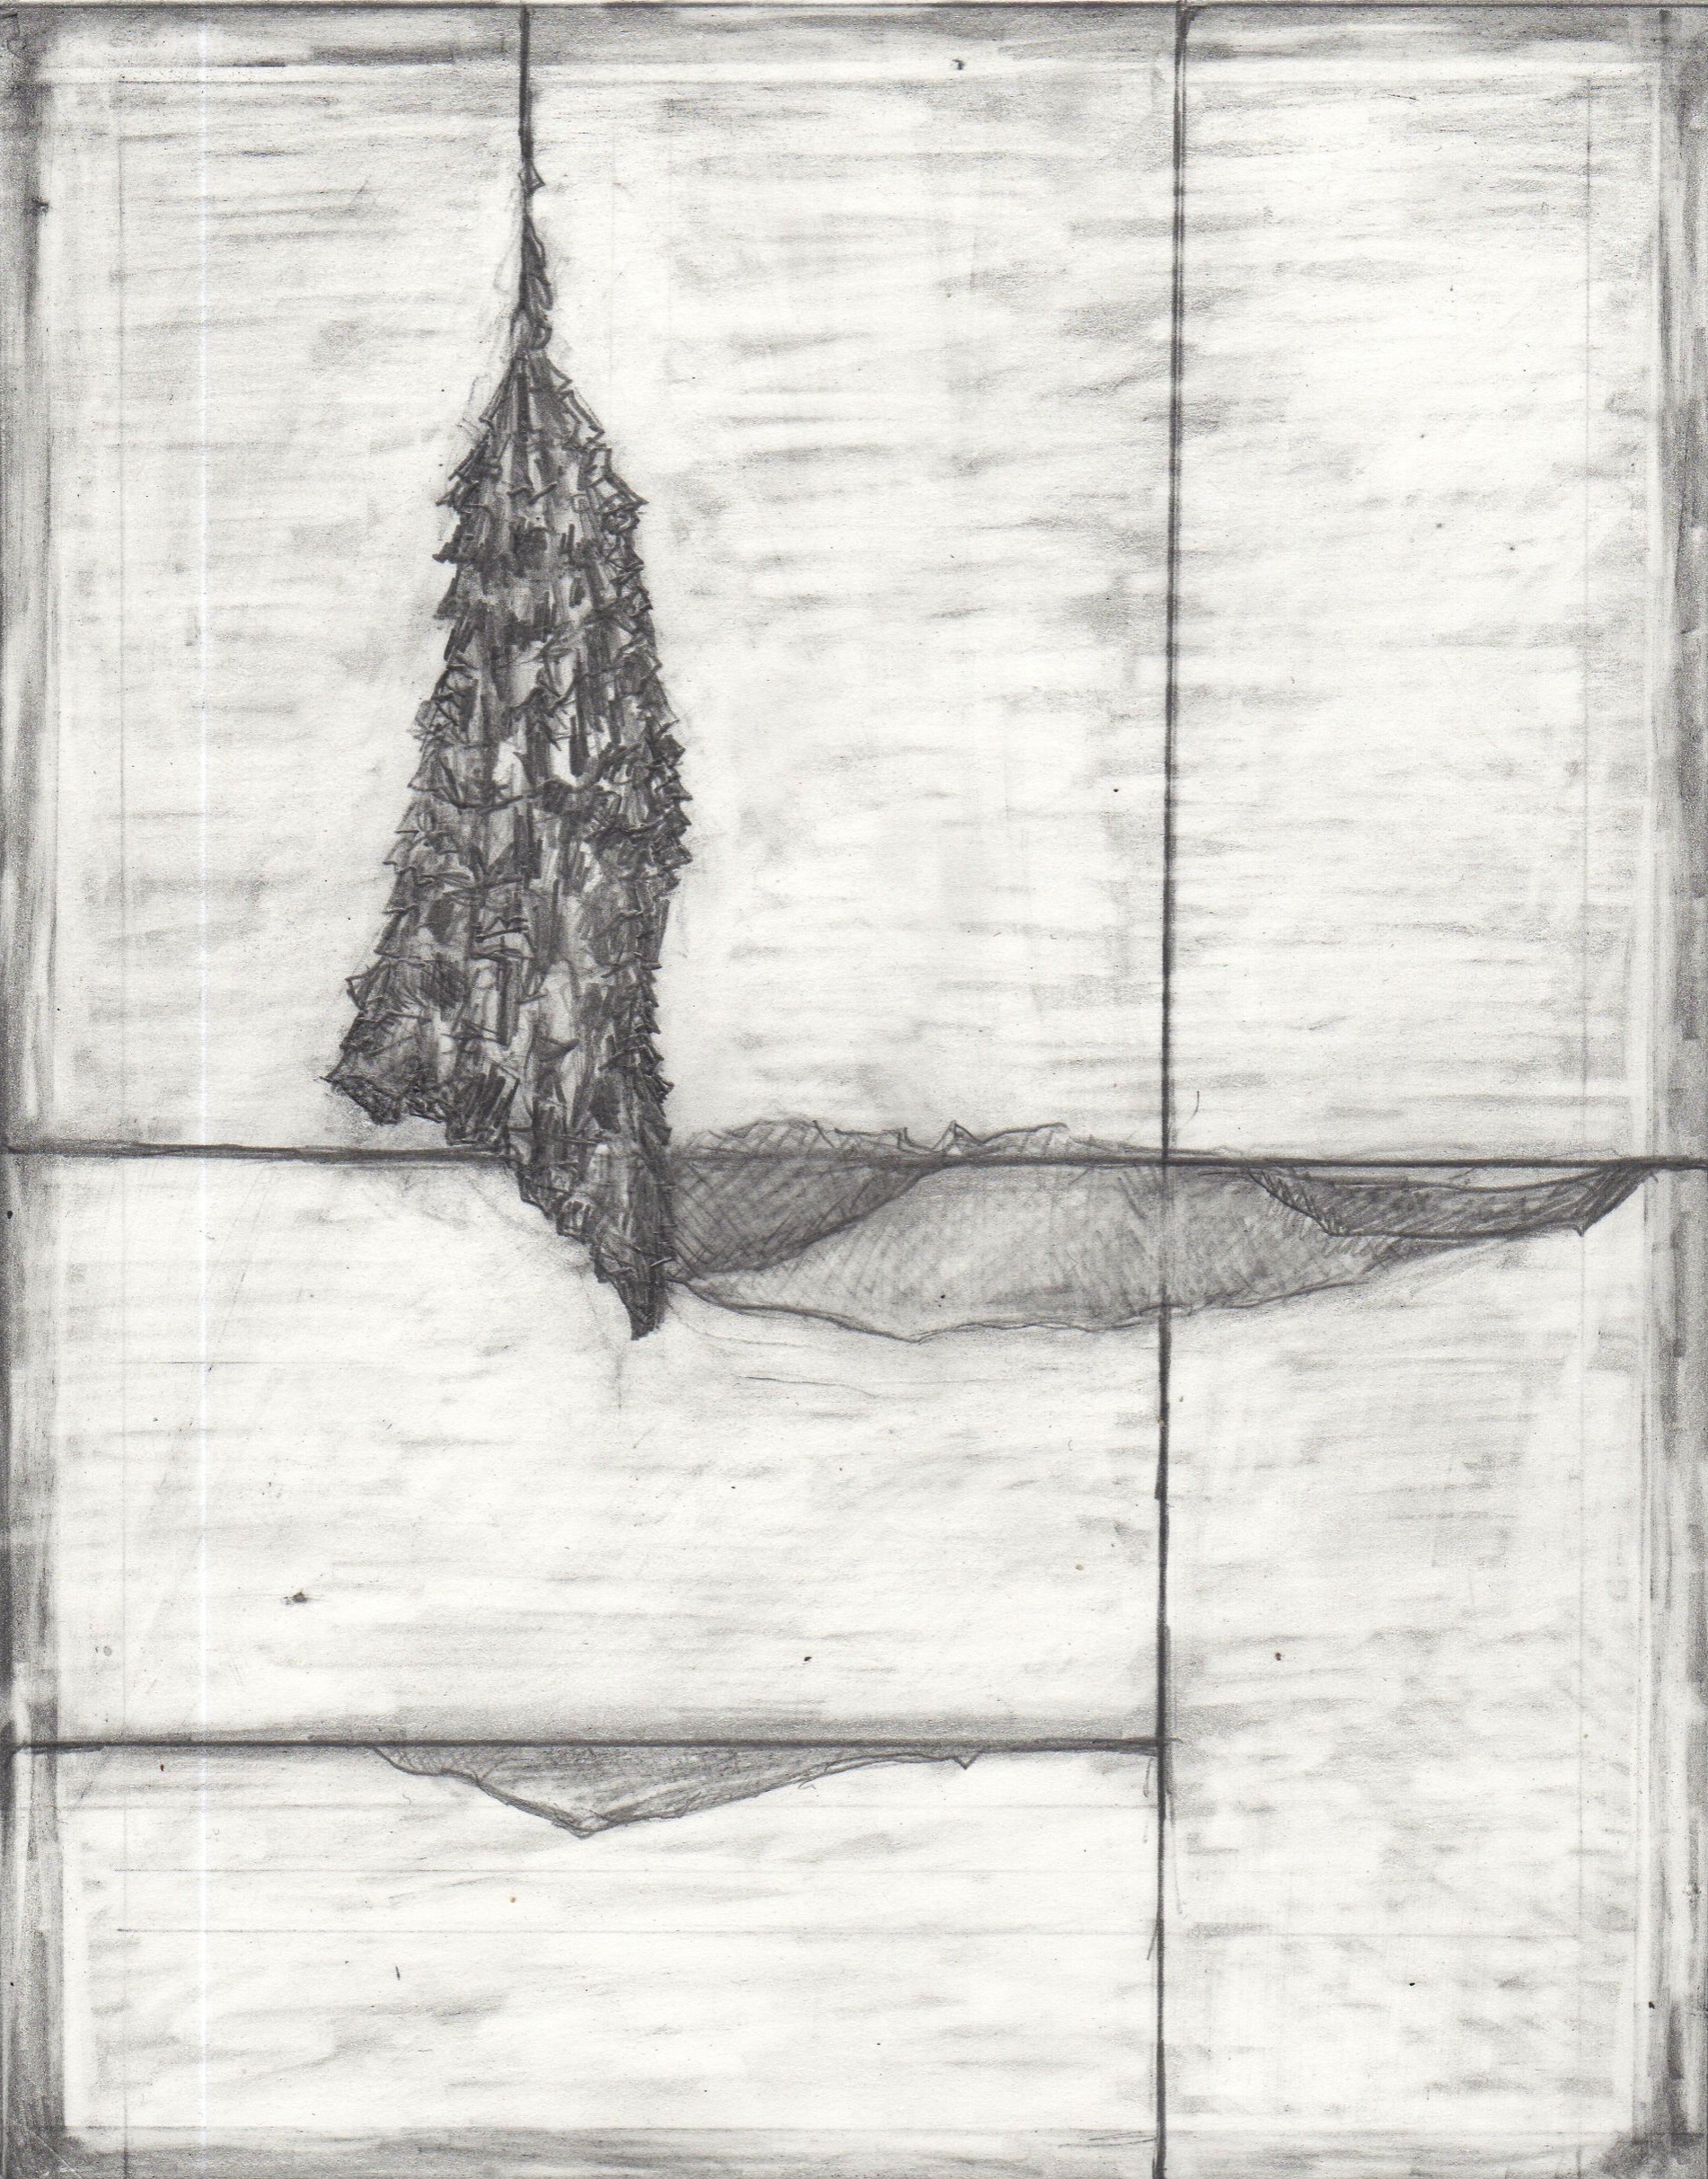 STUDY, graphite on paper, 2014